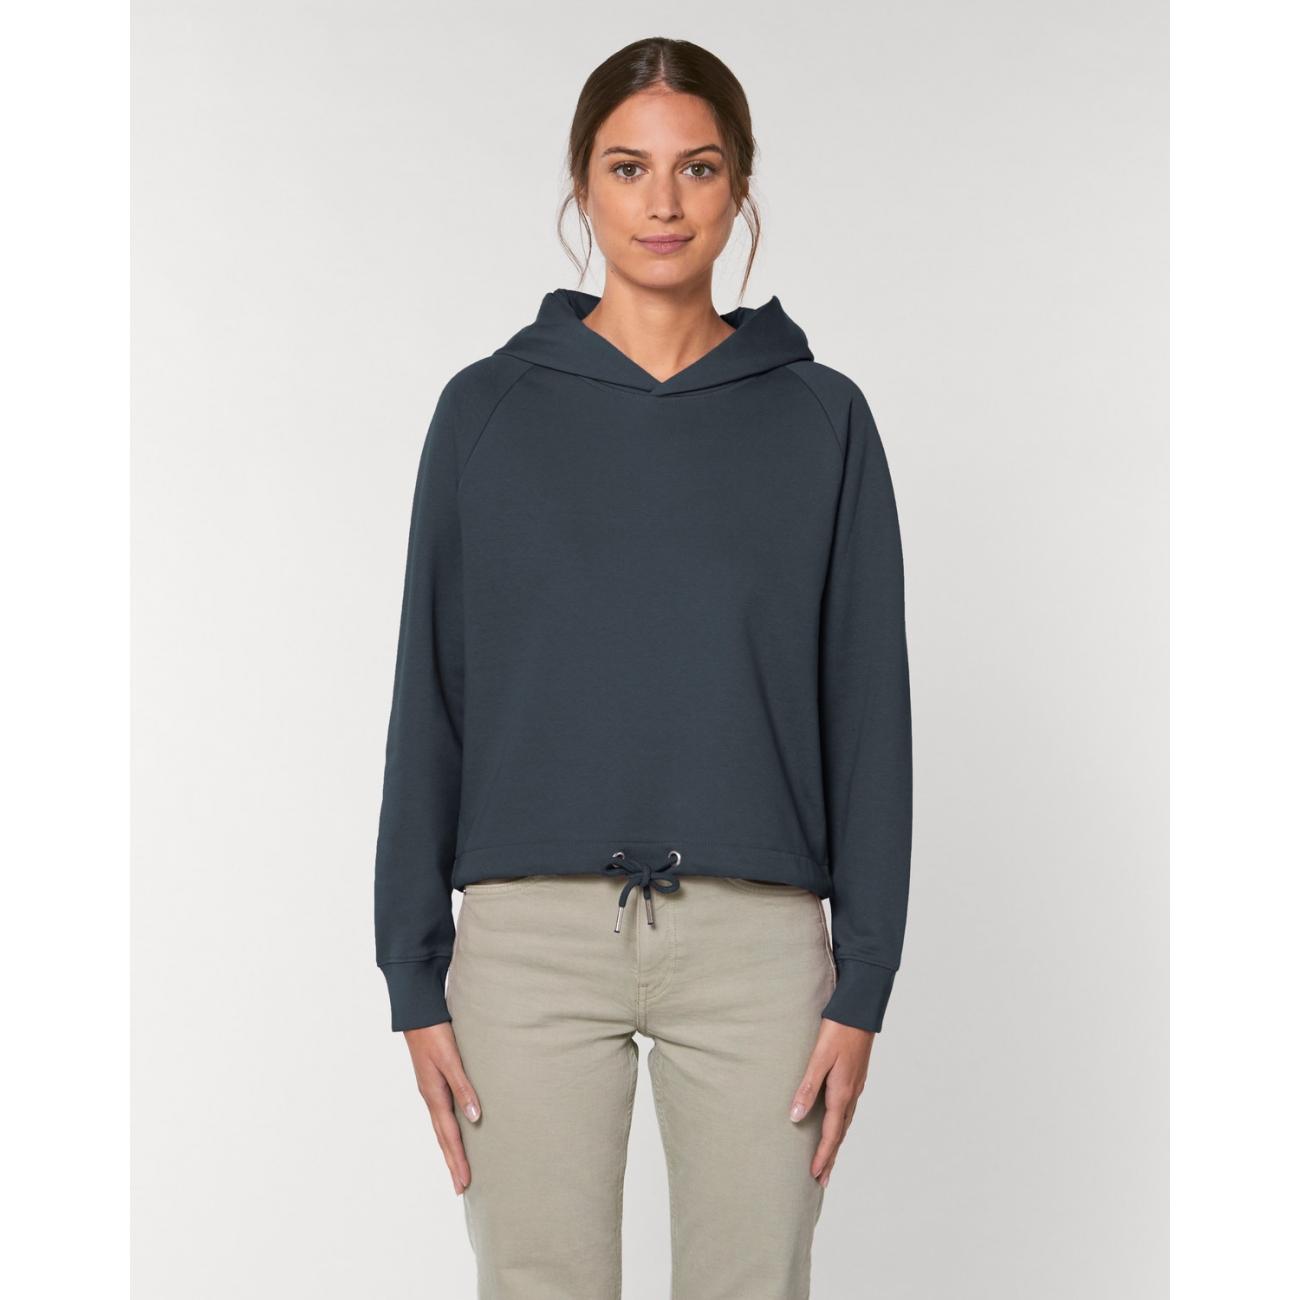 https://tee-shirt-bio.com/9909-thickbox_default/sweat-court-a-capuche-femme-coton-bio-gris-indien.jpg